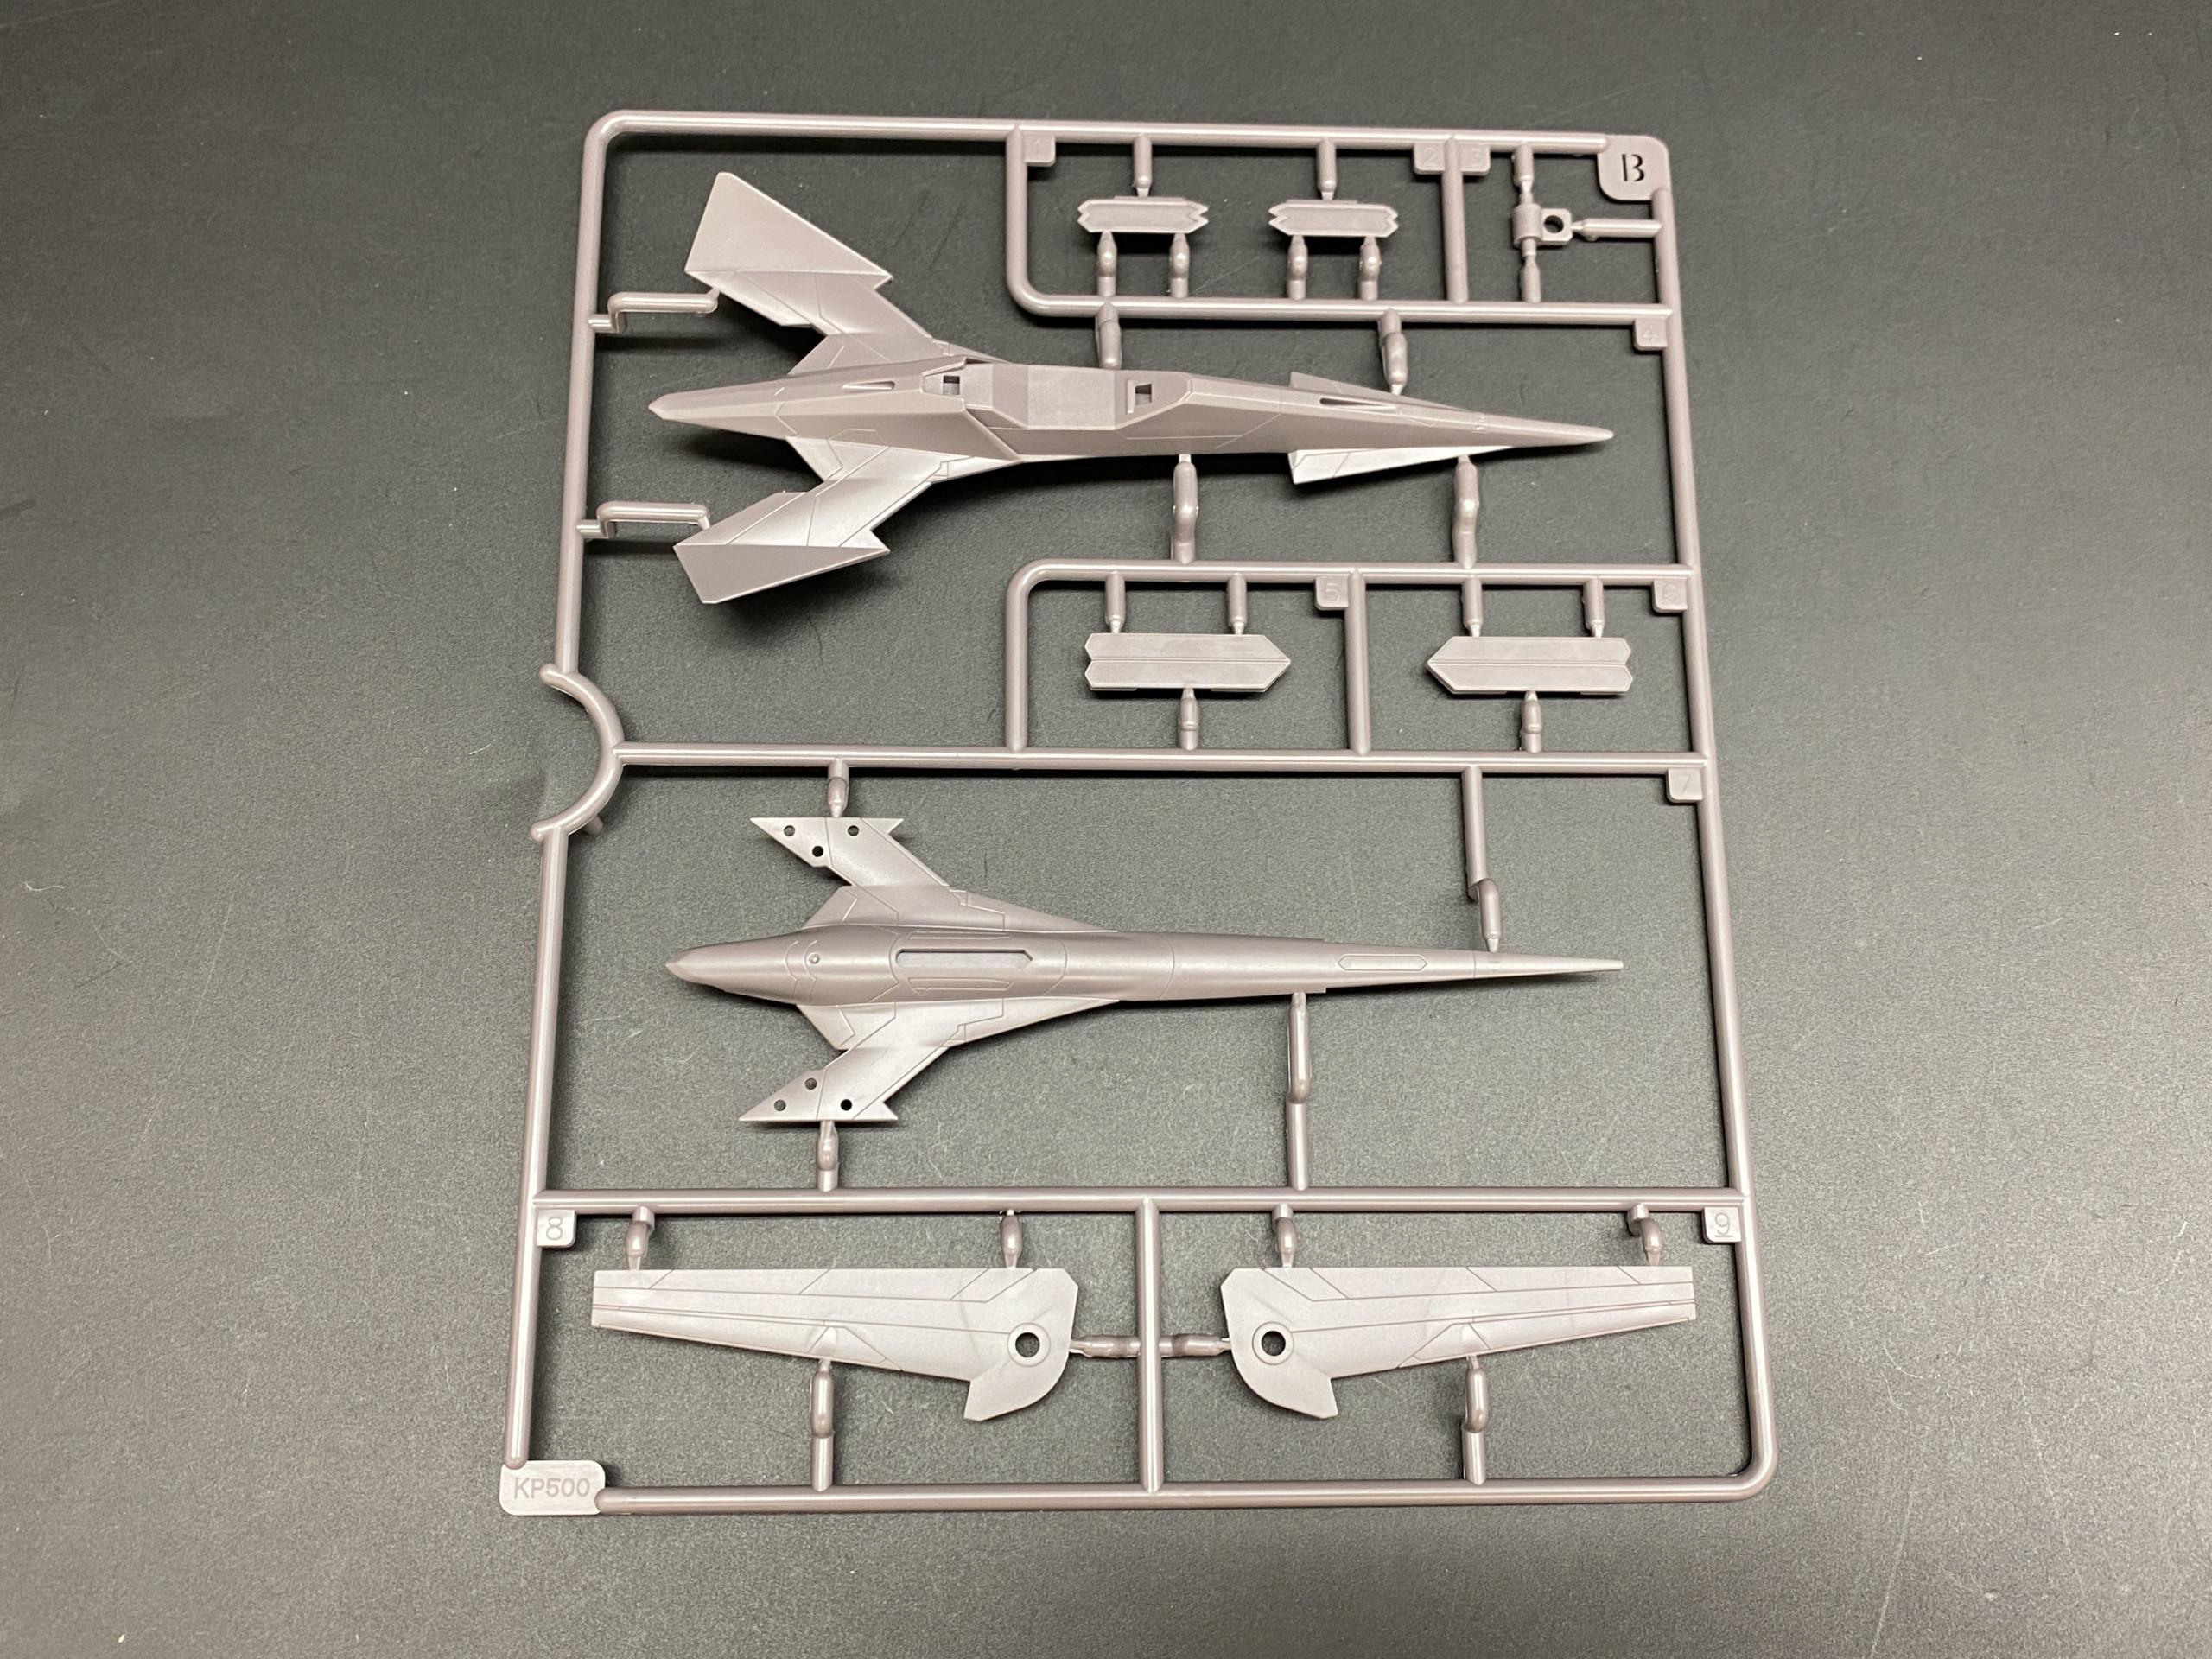 1/144 ADF-11F (Ace Combat 7: Skies Unknown)